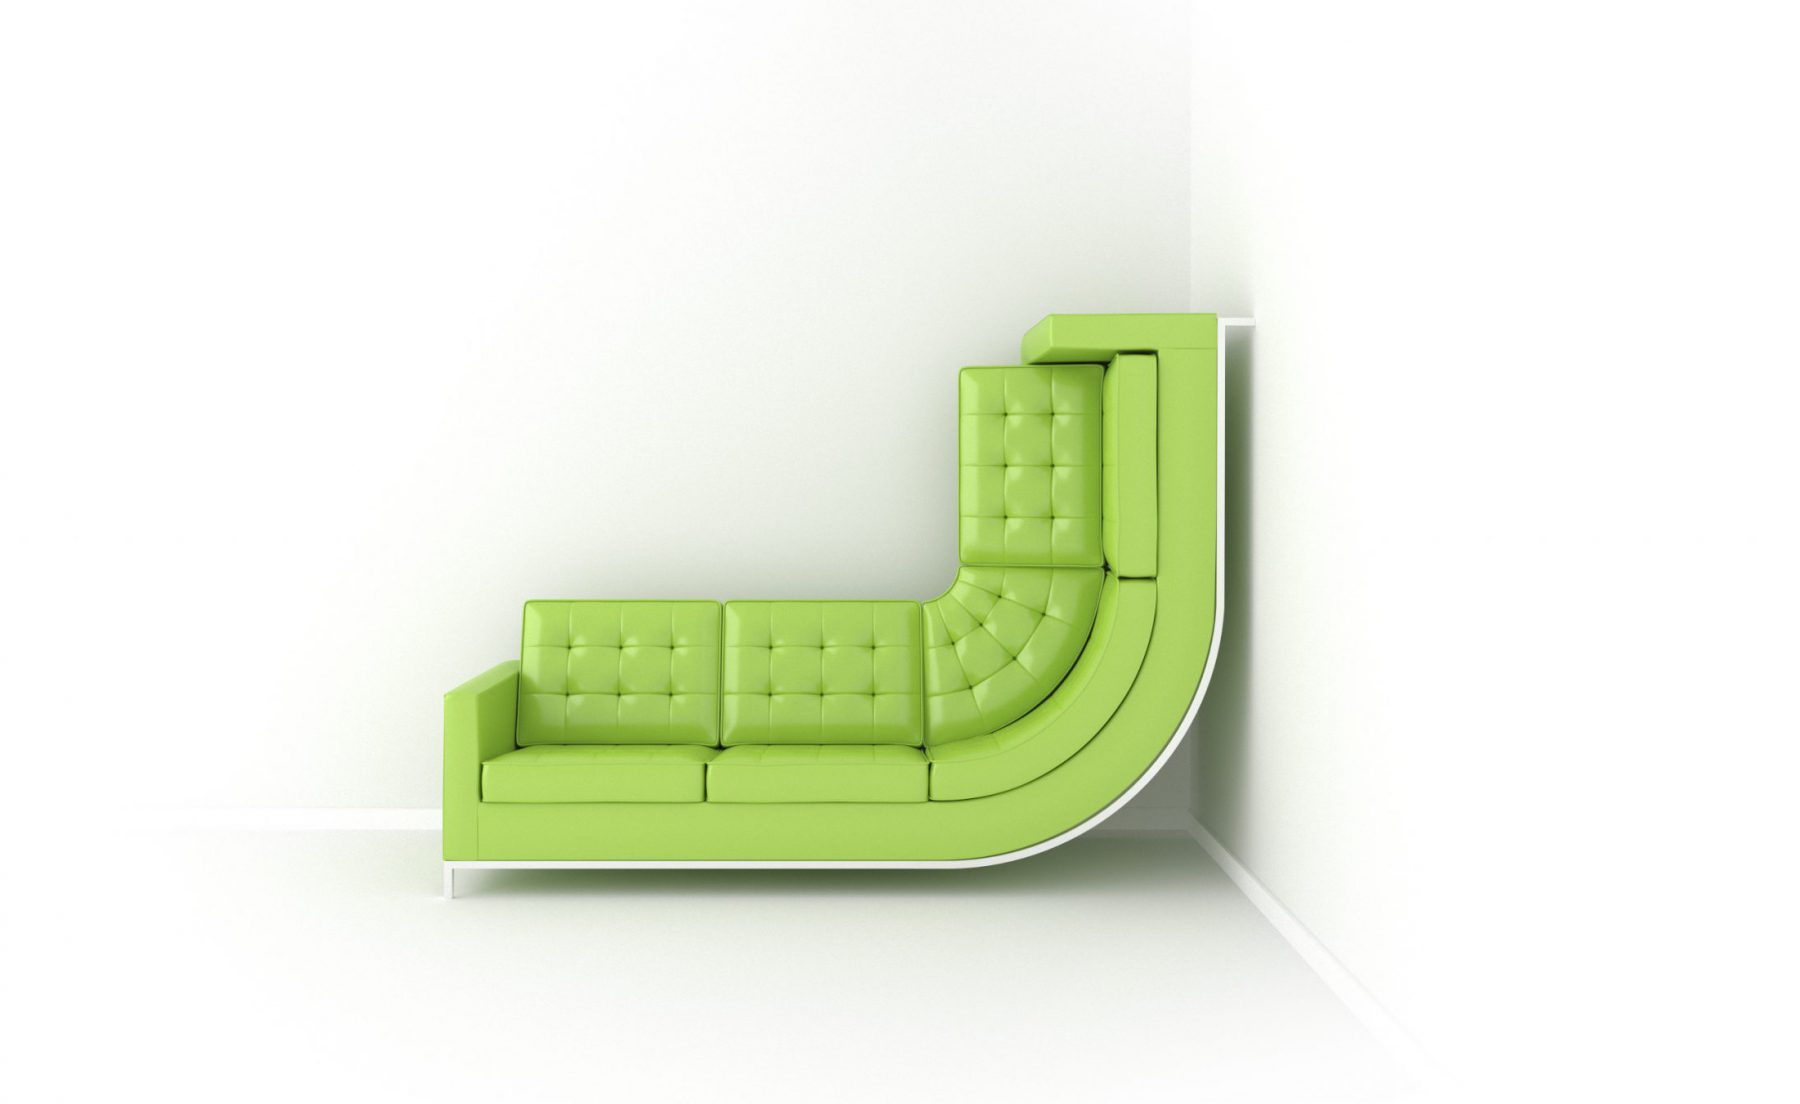 Render Sofá verde trepando